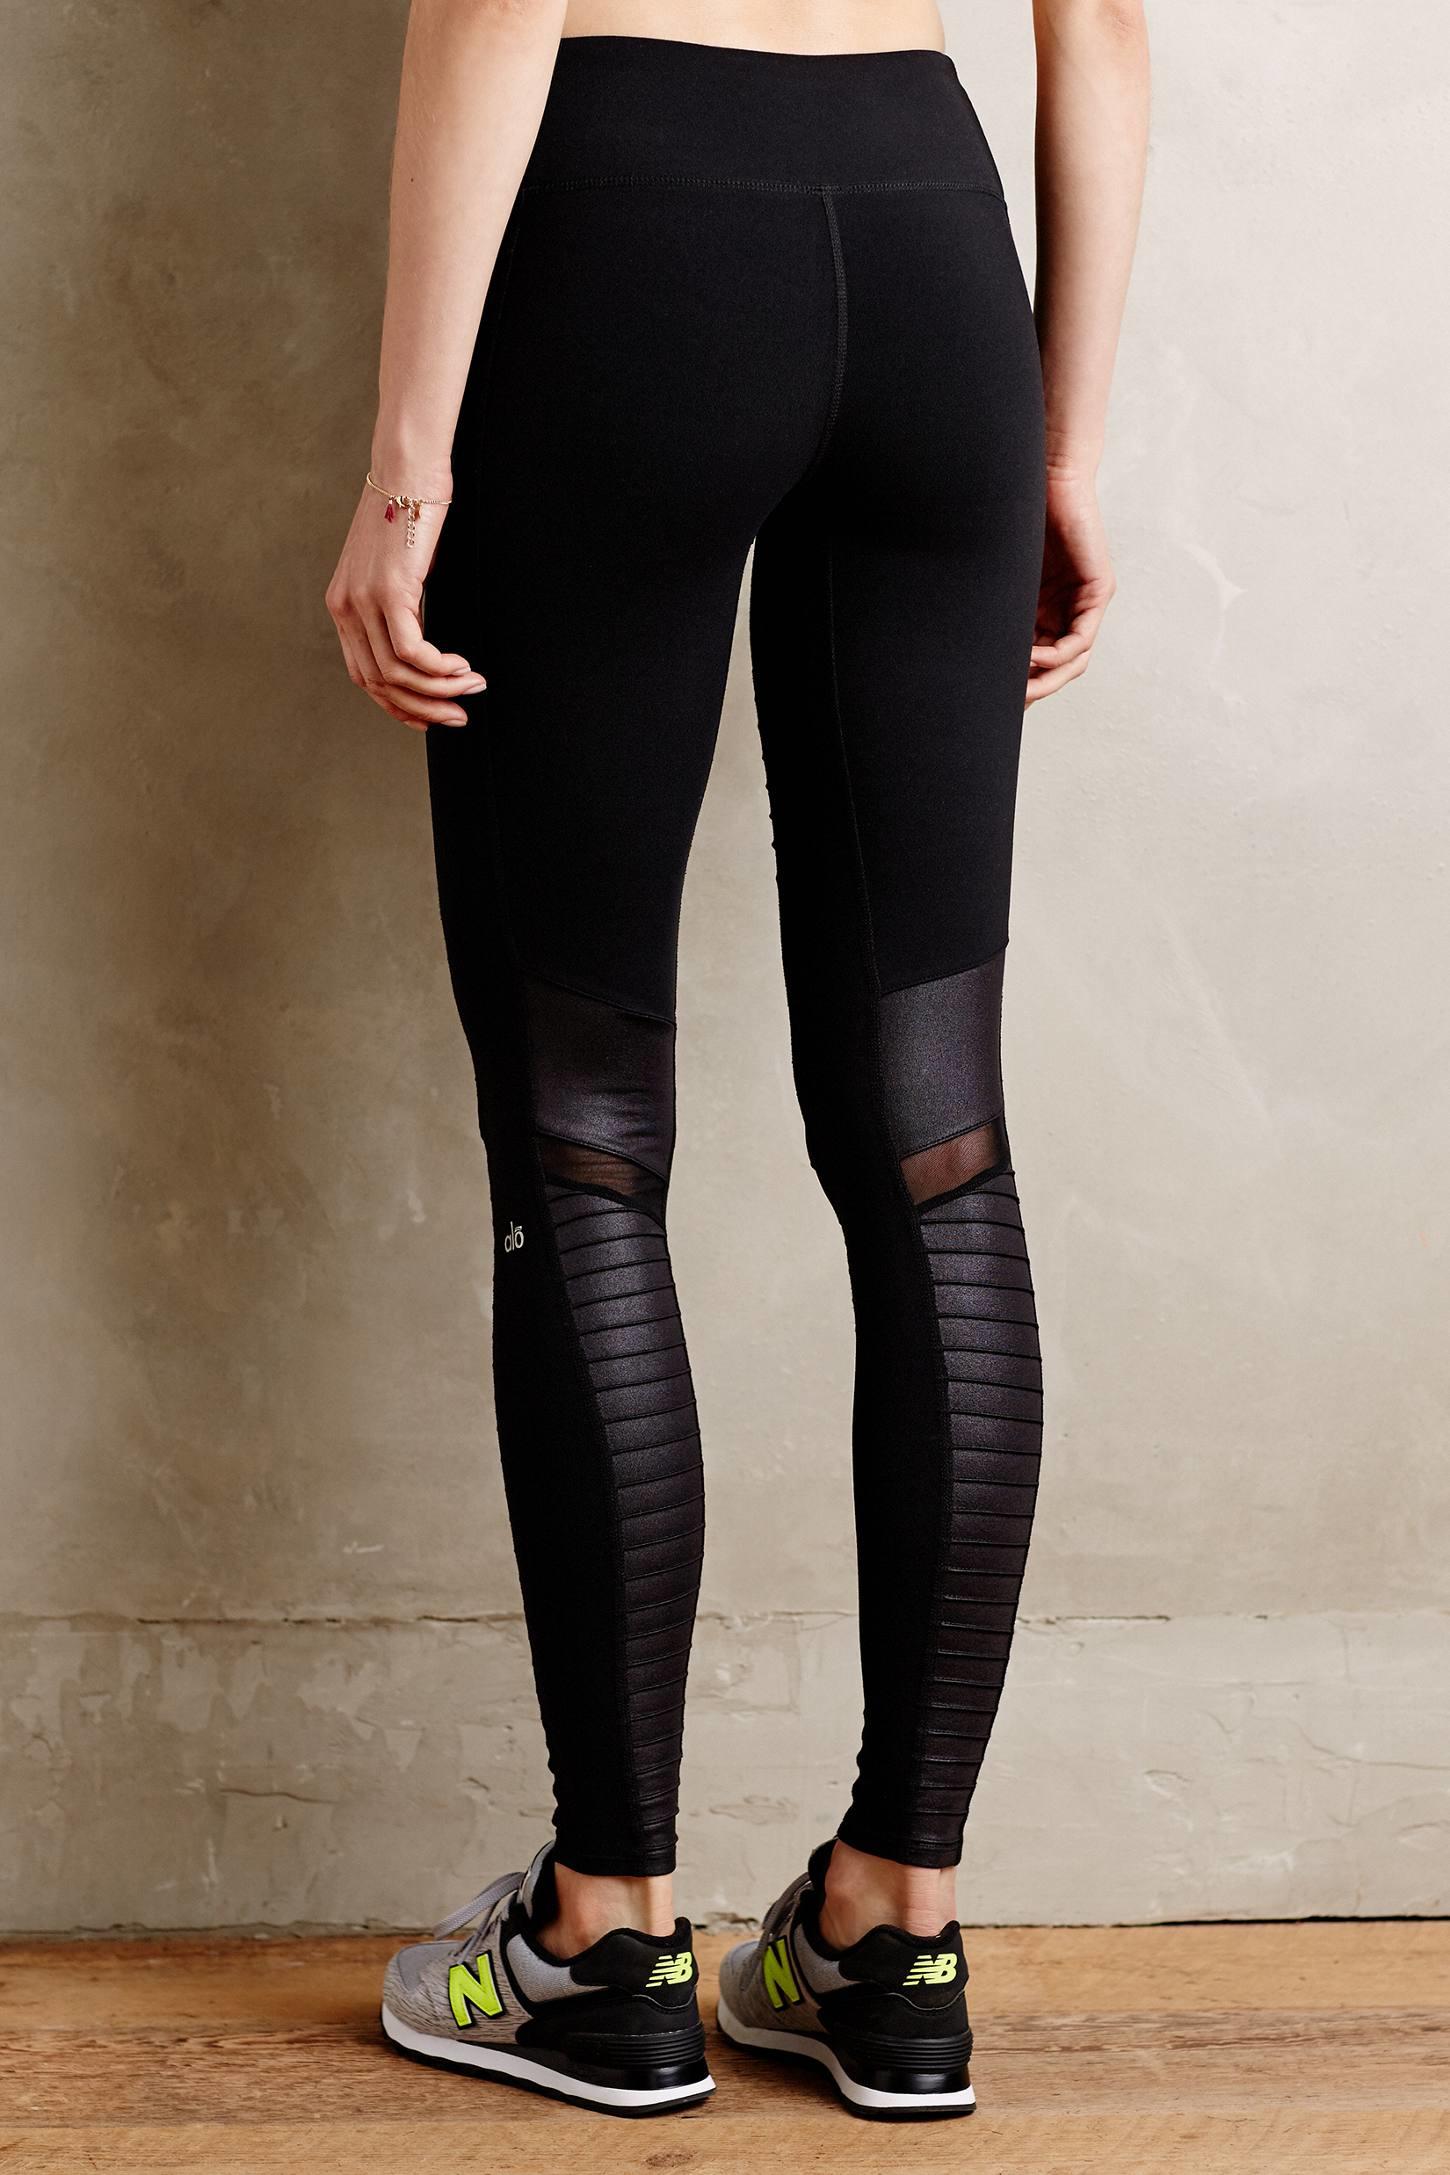 Alo yoga Moto Performance Leggings in Black